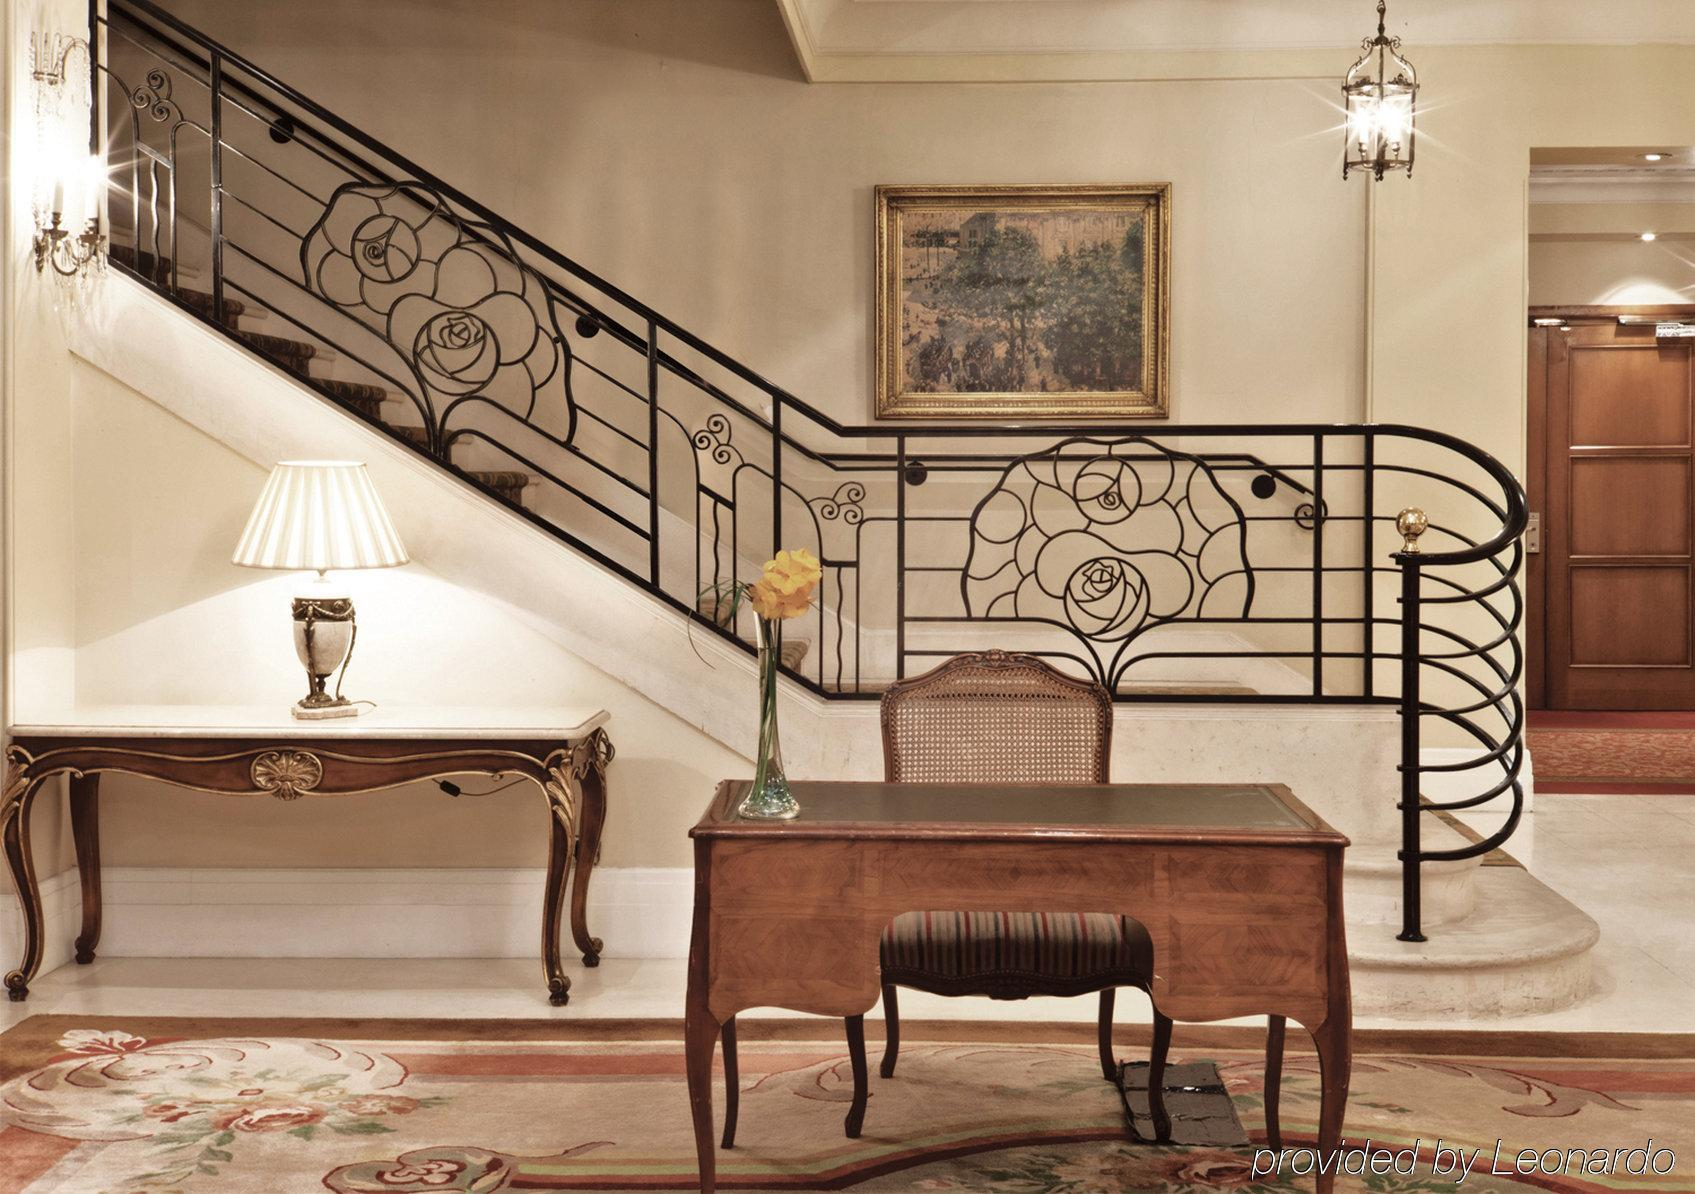 millennium hotel paris opera parijs. Black Bedroom Furniture Sets. Home Design Ideas